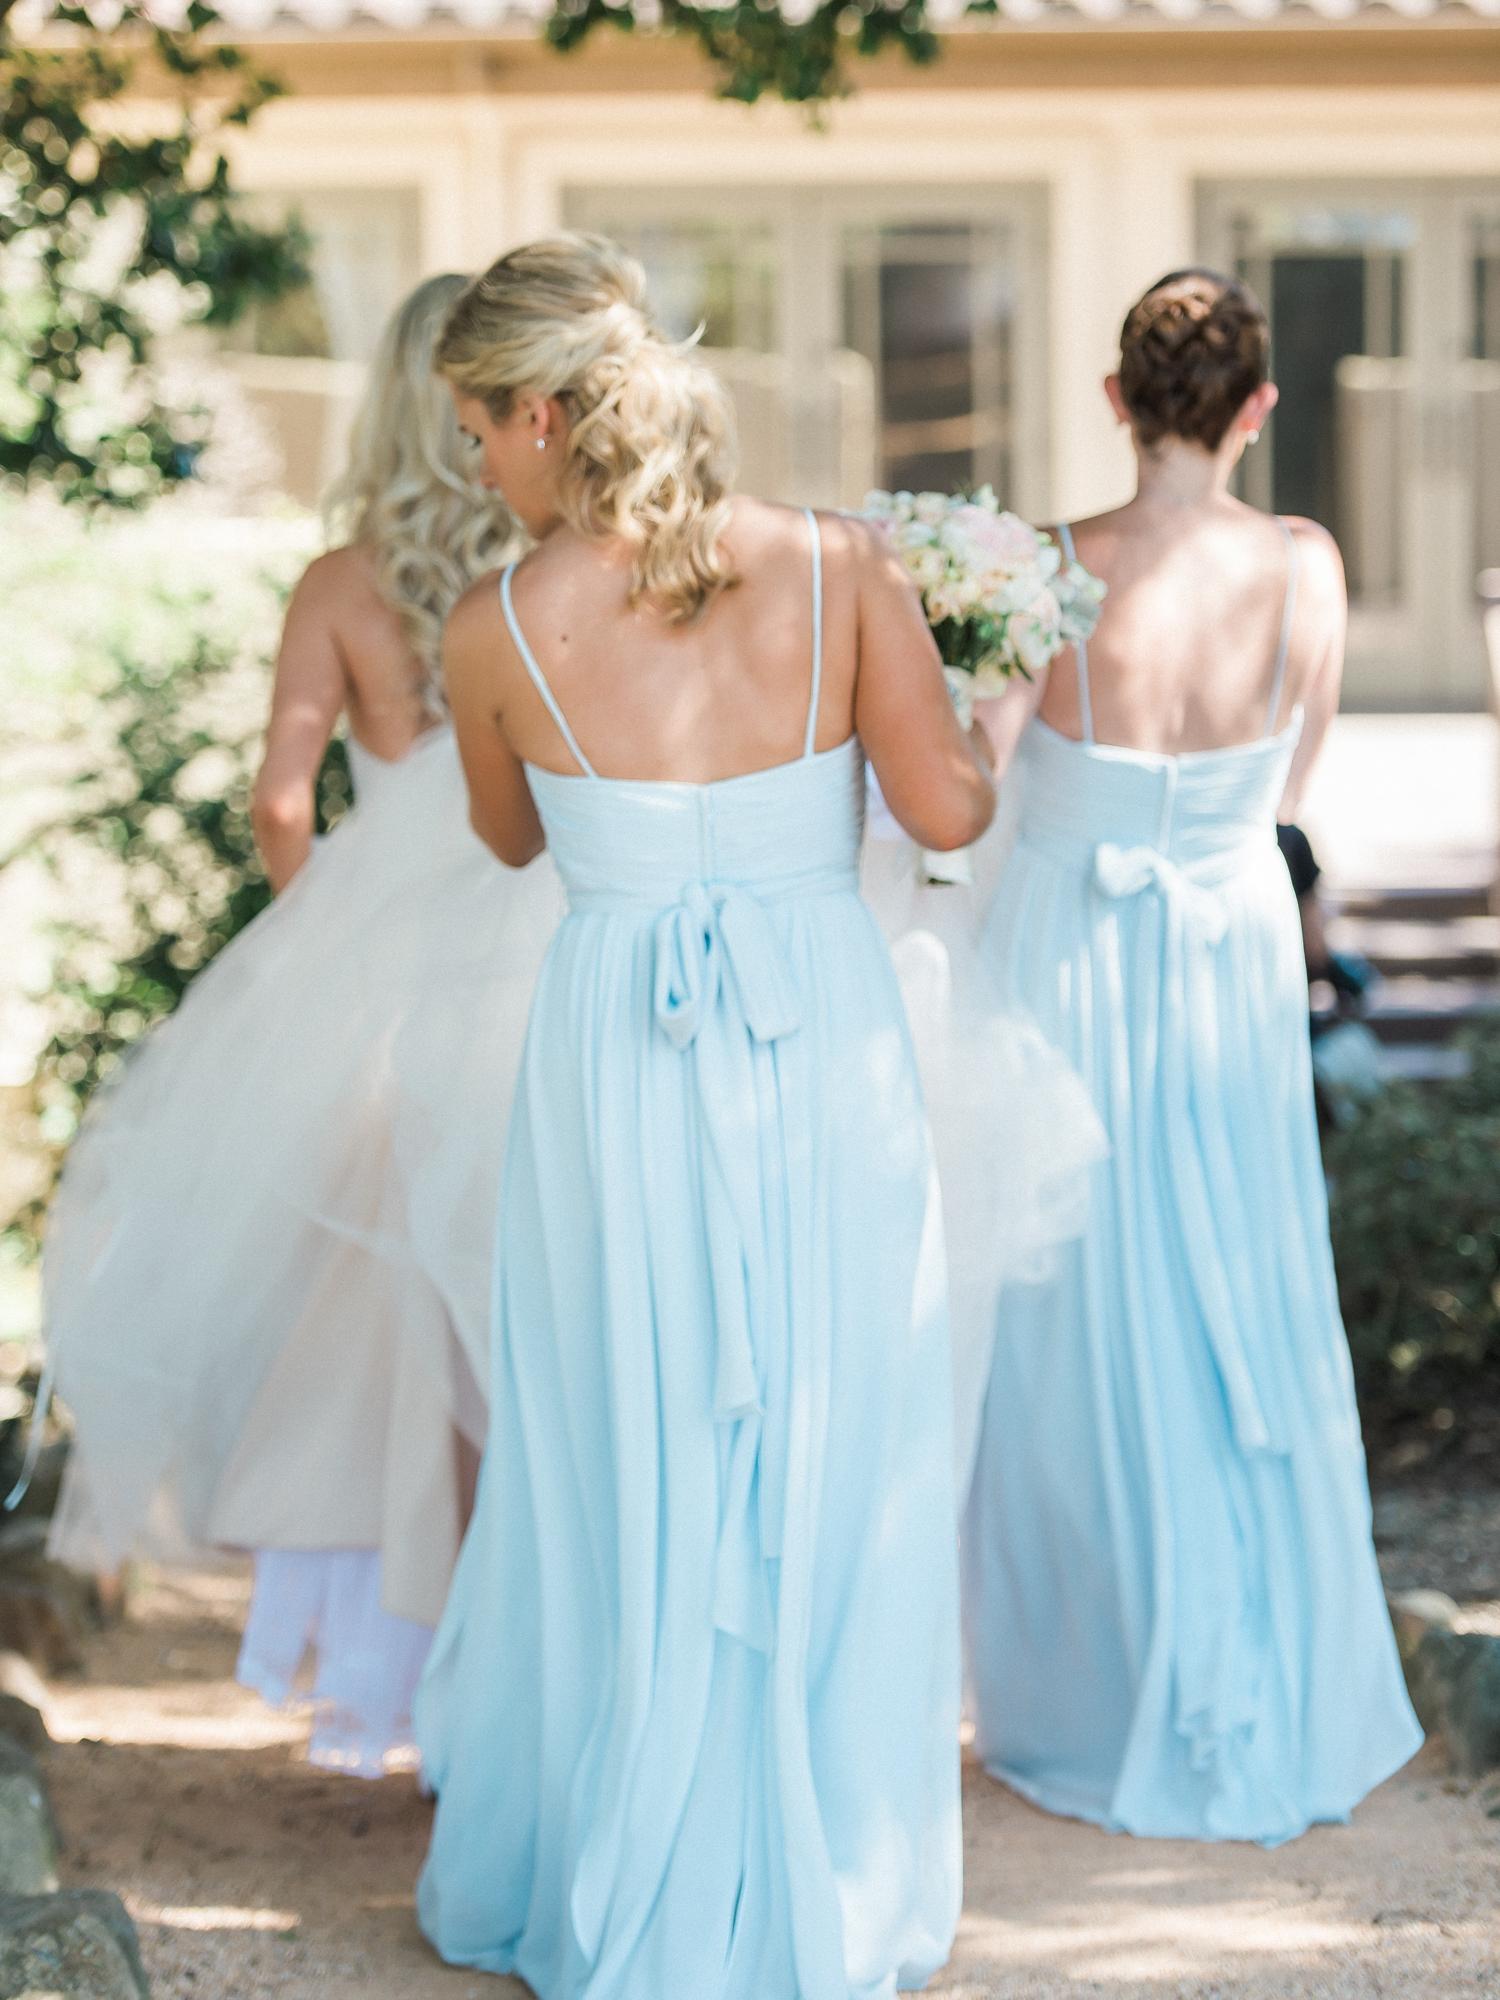 Aimee+Logan_wedding_spp-28.jpg